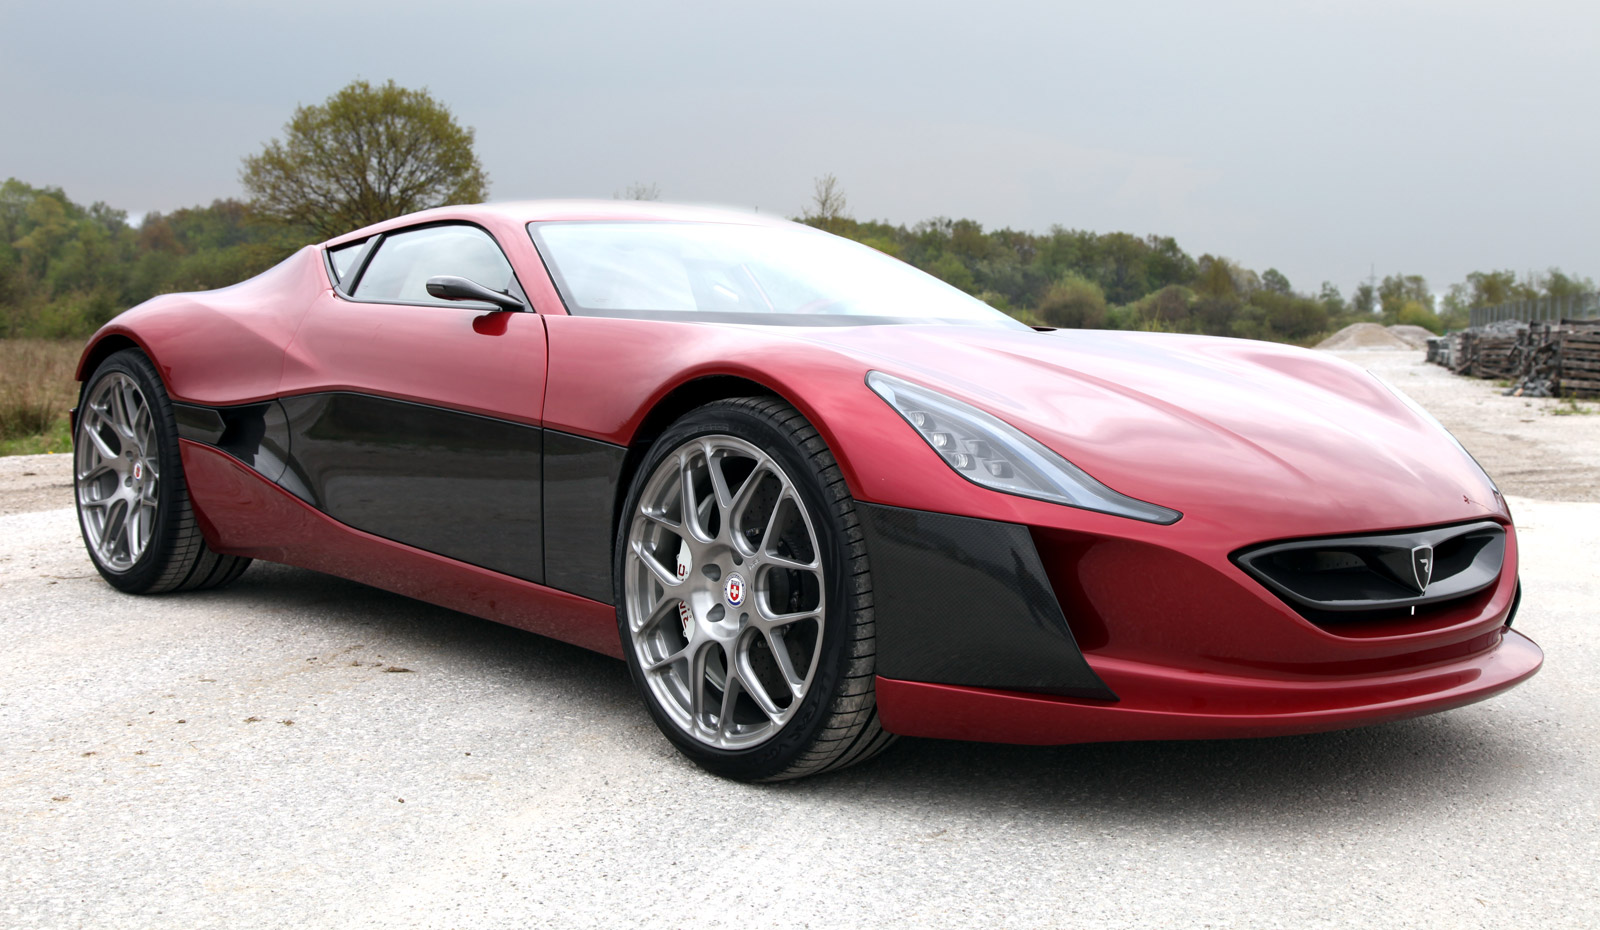 Tesla Supercar Image Gallery Hcpr